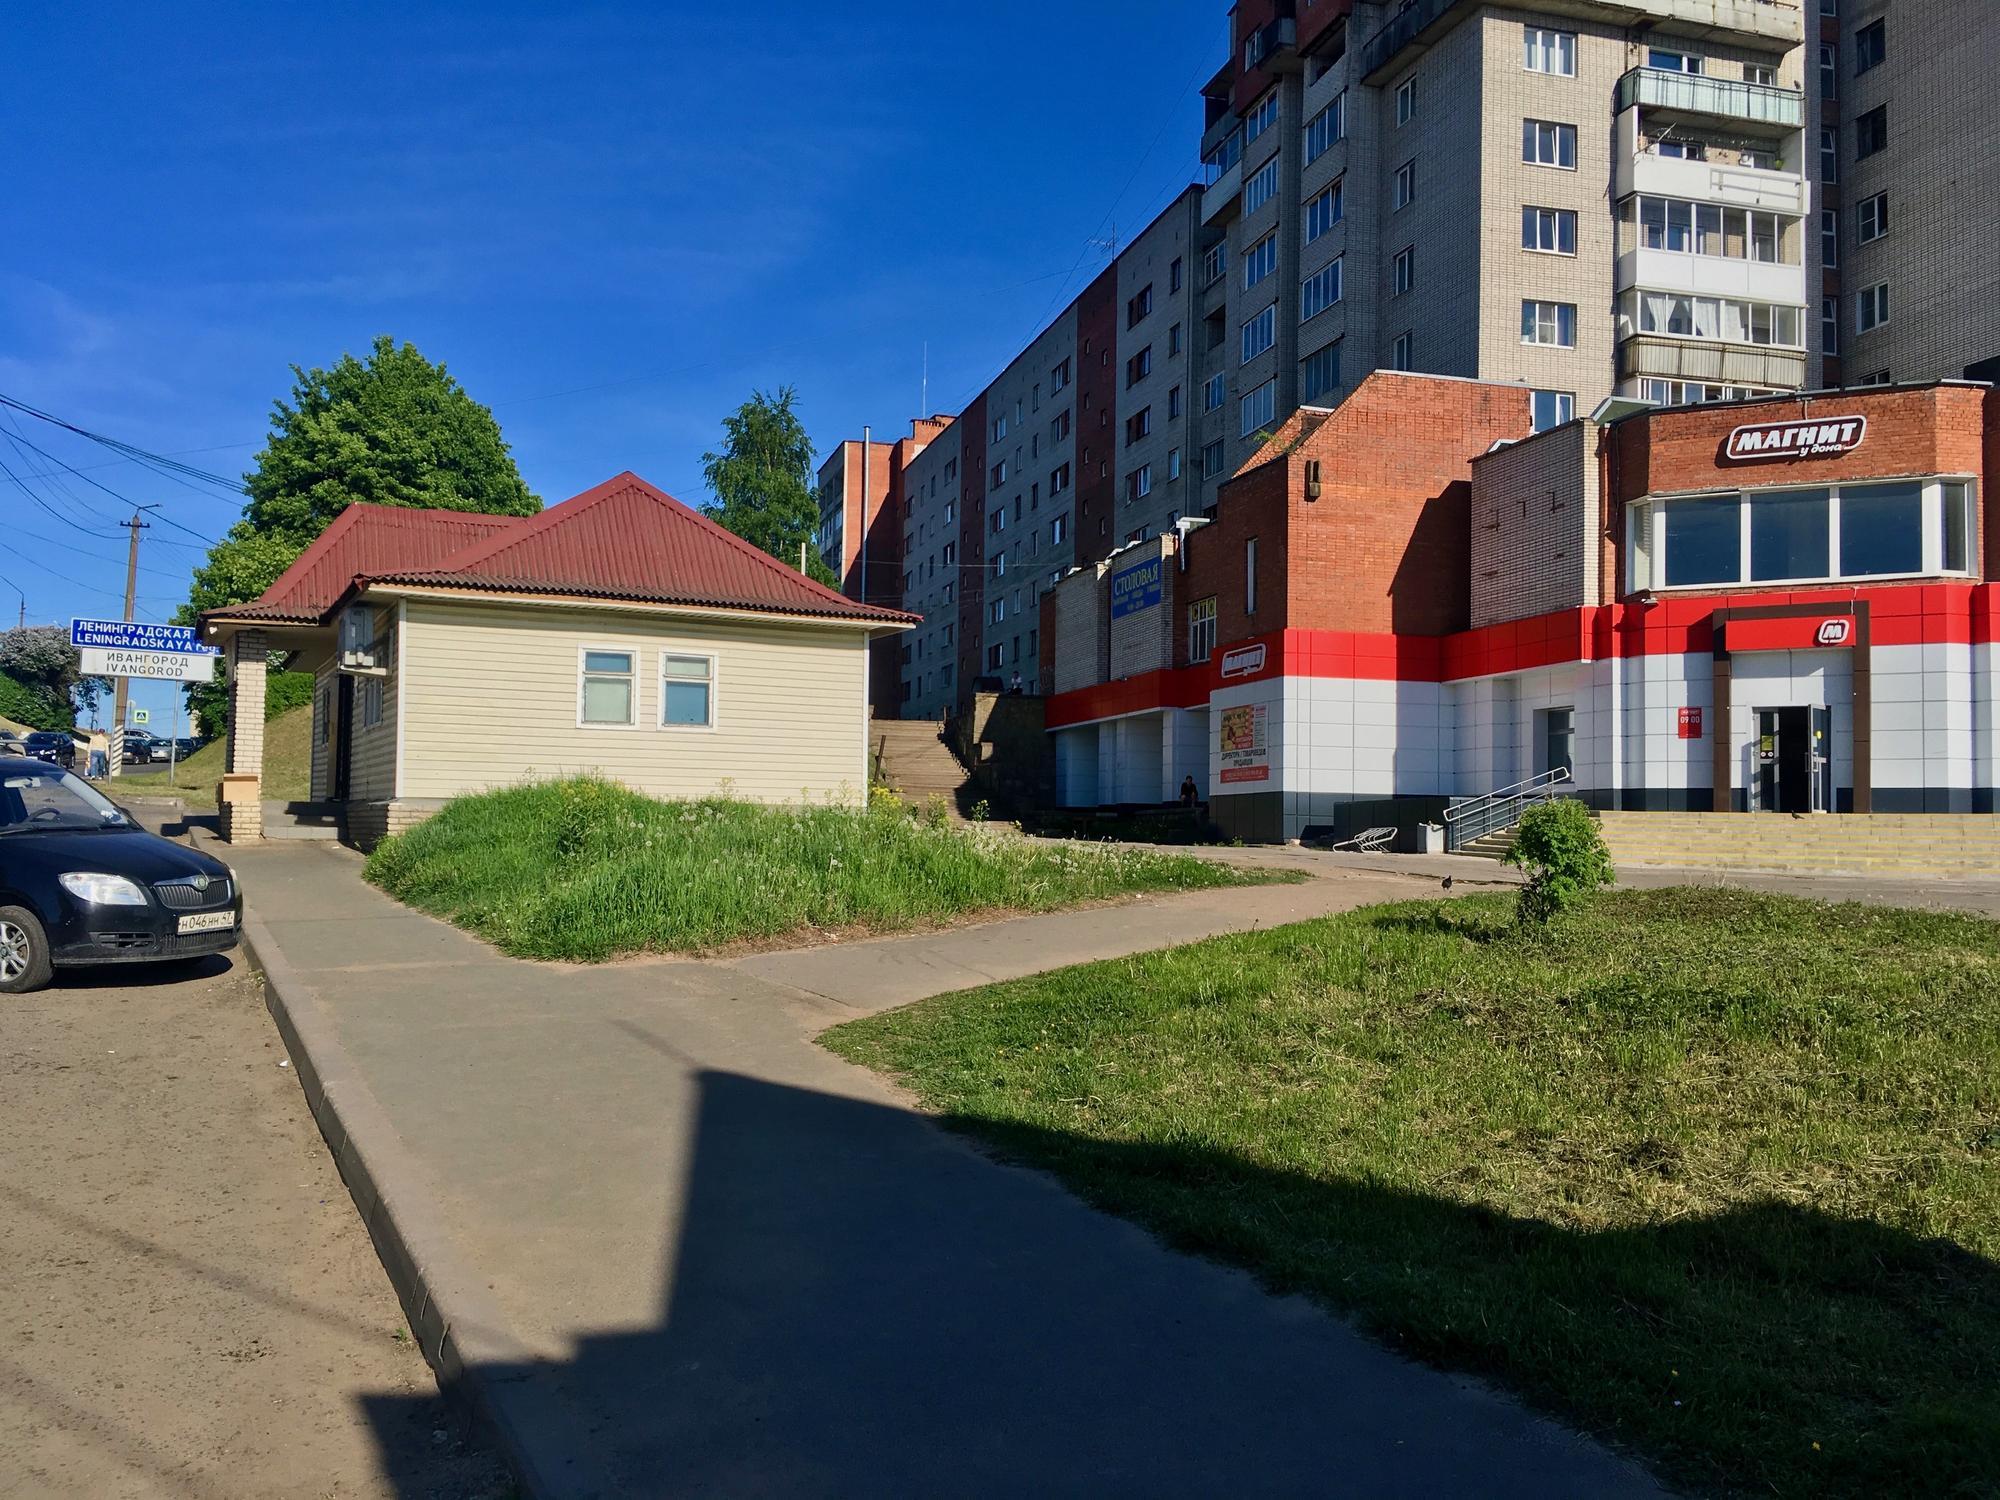 🇷🇺 Ivangorod, Russia, may 2018.